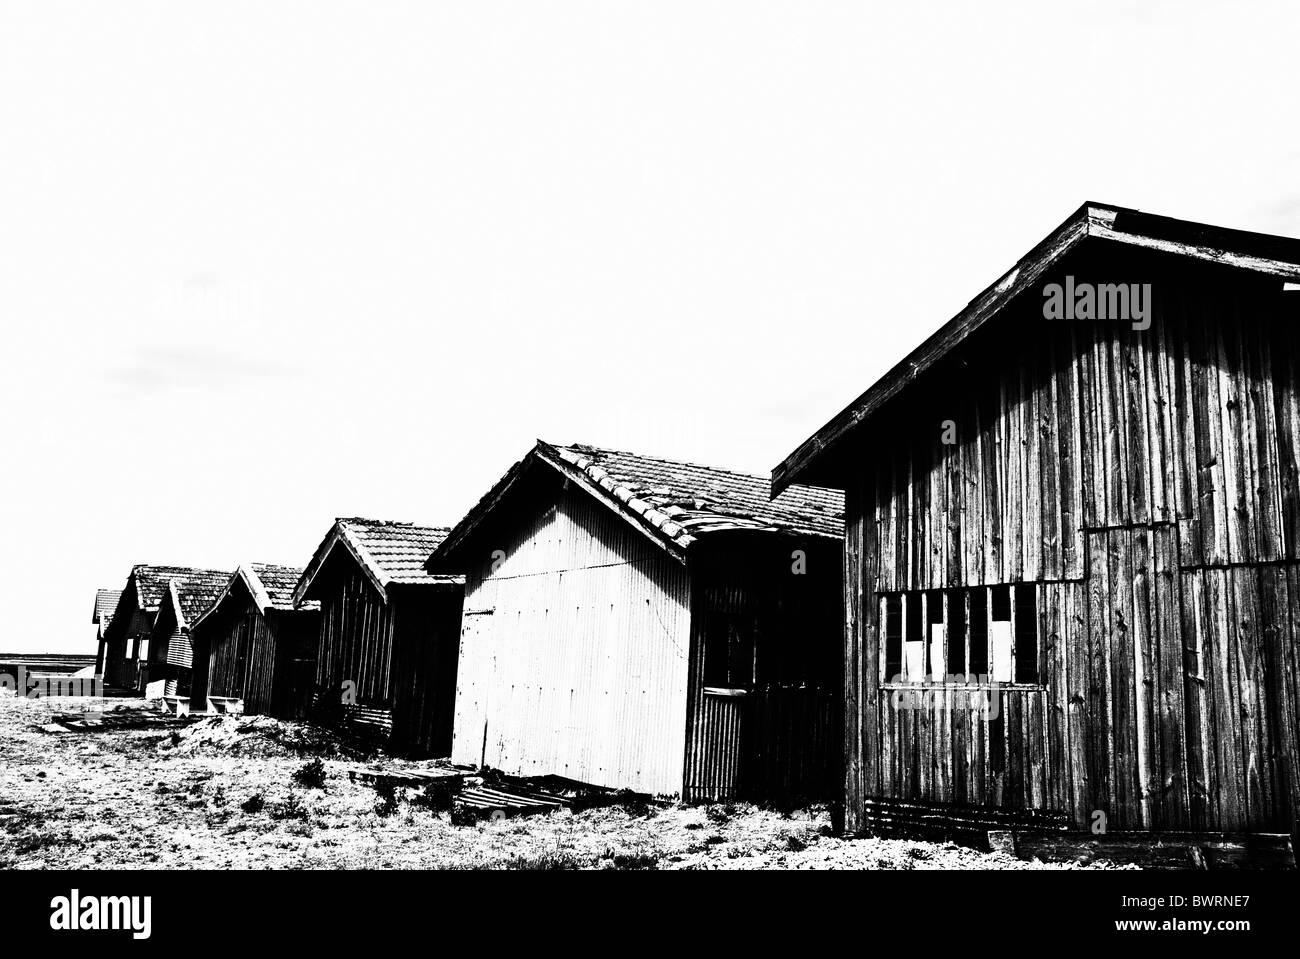 Oyster breeding sheds at Laramos Port on Bassin d'Arcachon, France. - Stock Image